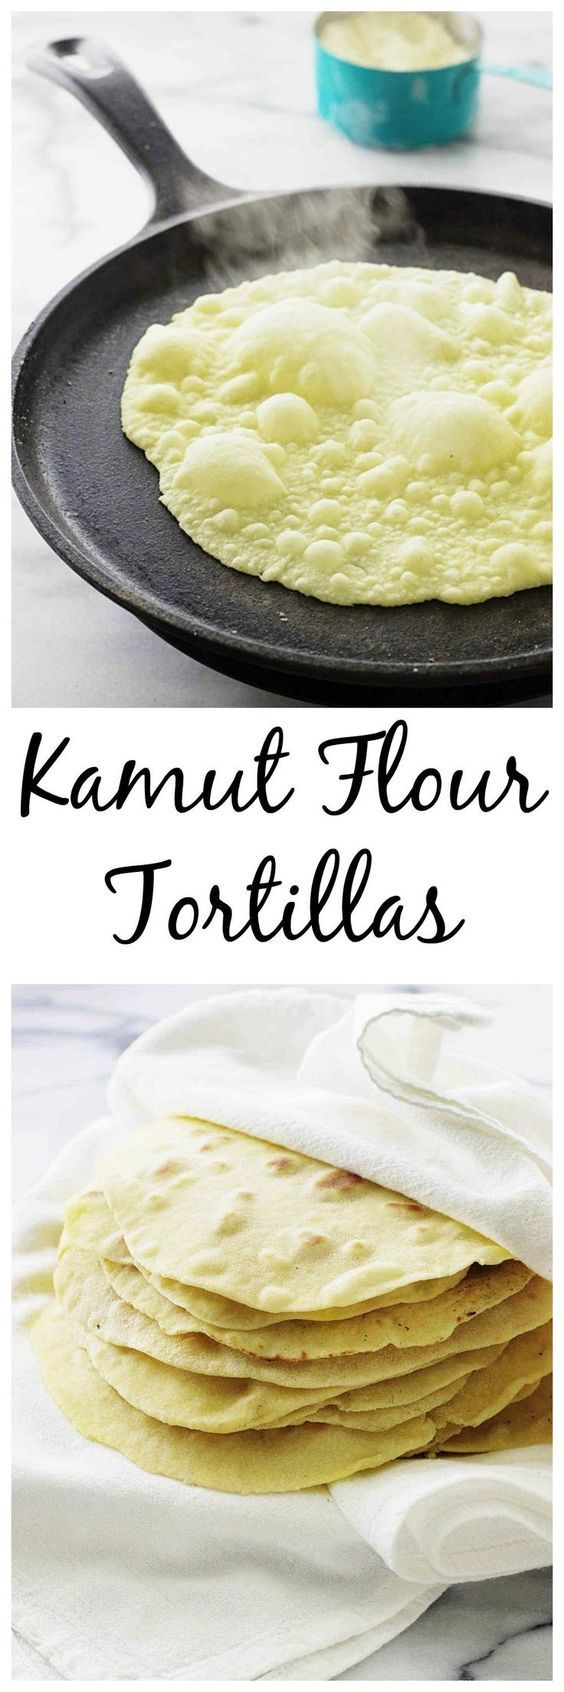 Kamut Flour Tortillas | Recipe | Kamut flour, Recipes ...